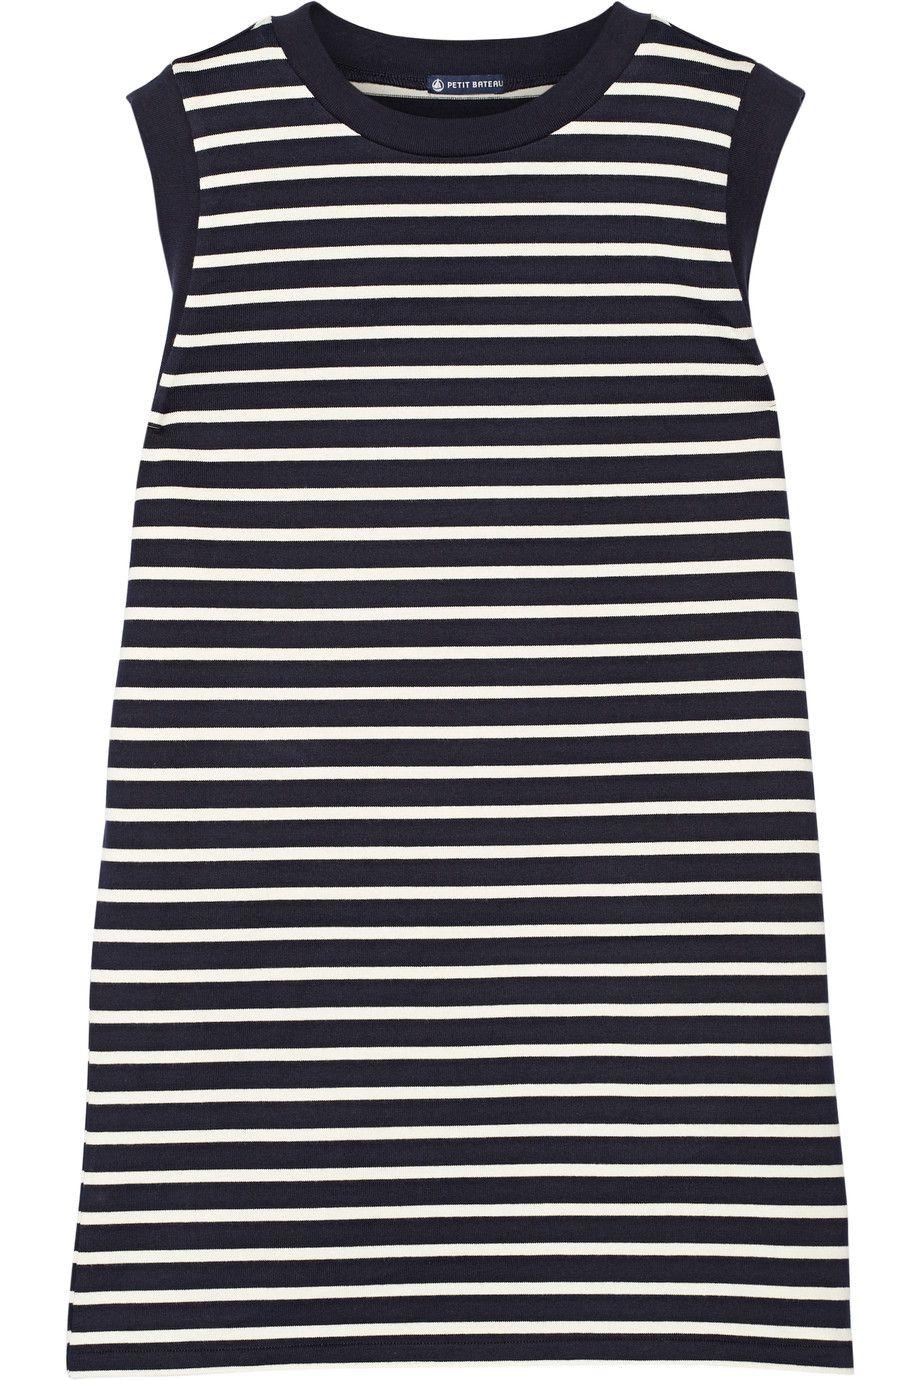 Striped cotton mini dress | Petit Bateau | 45% off | UK | THE OUTNET